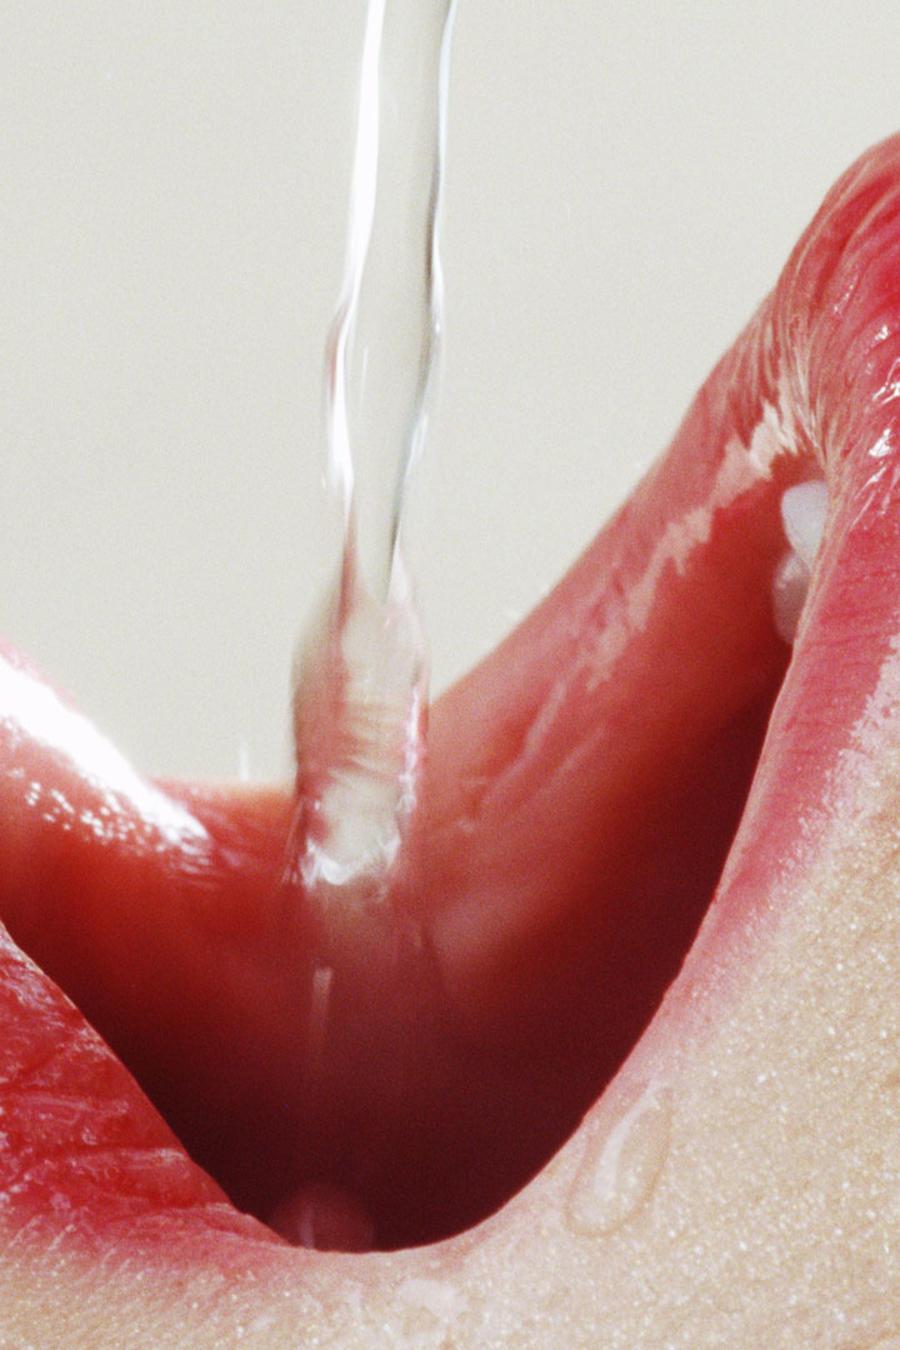 Agua cayendo sobre la boca de una mujer